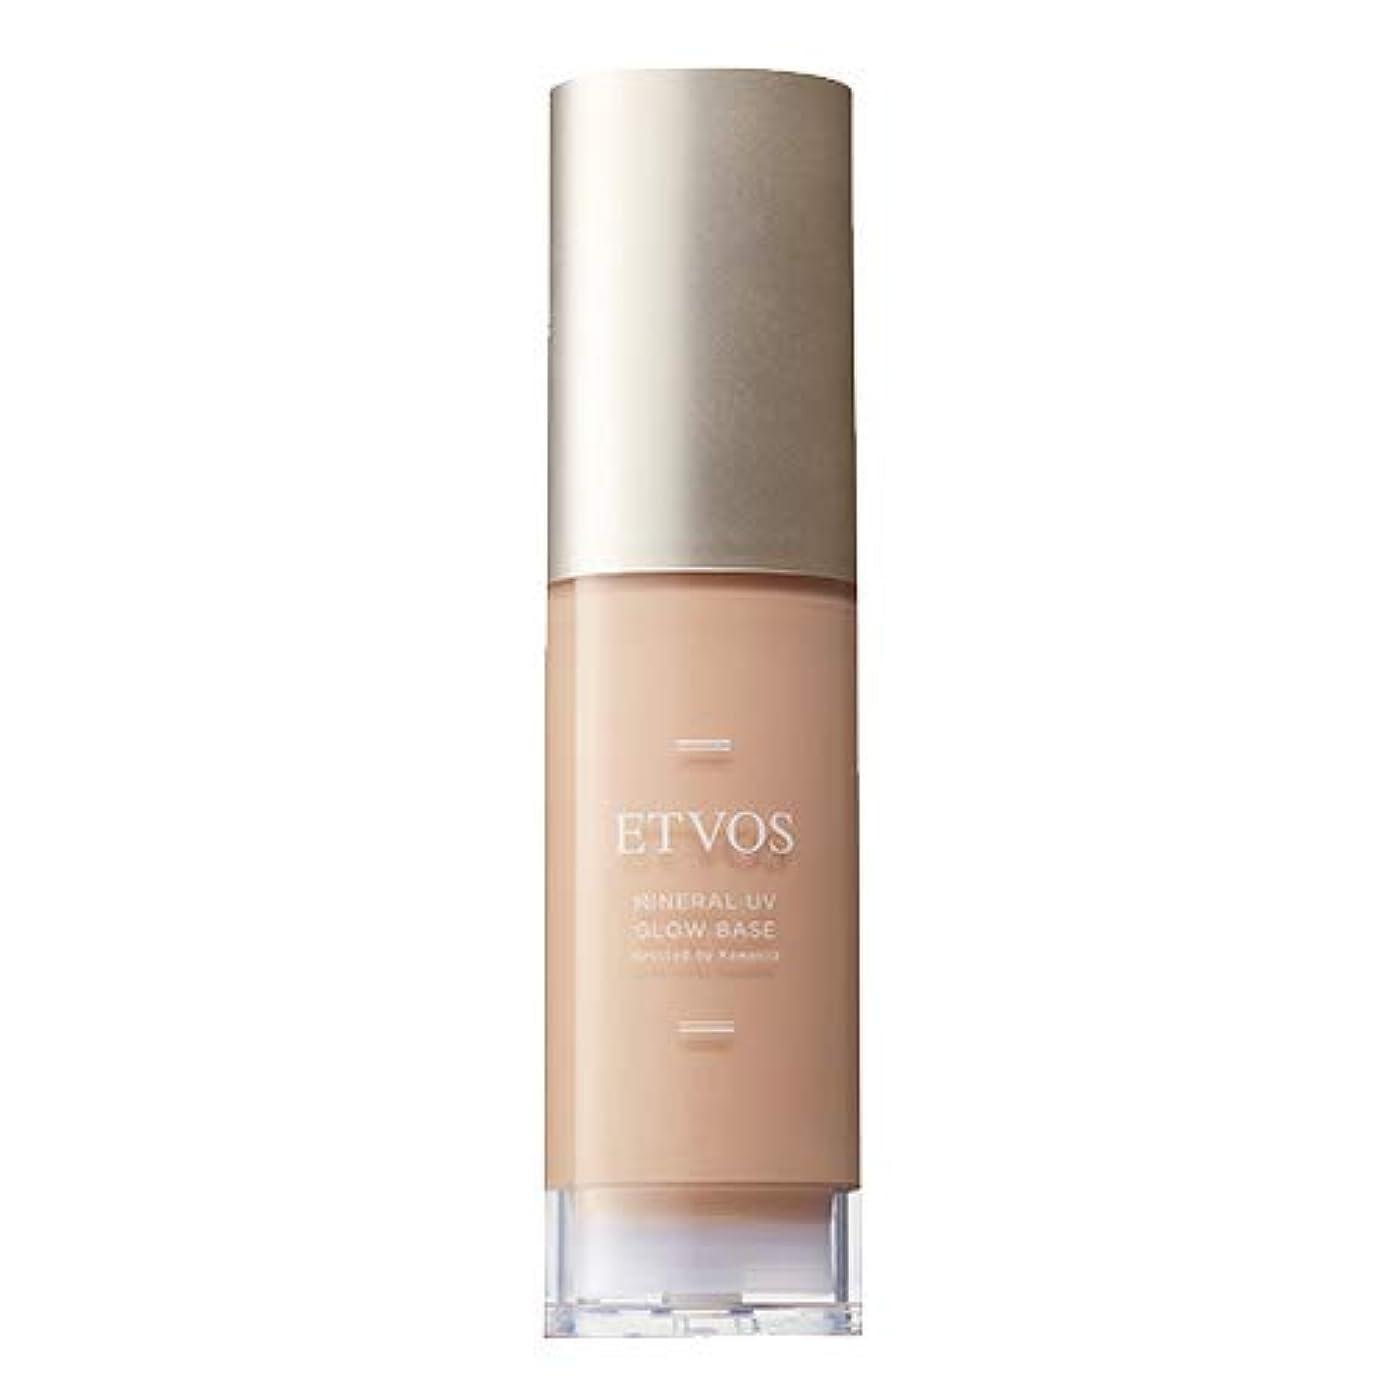 ETVOS(エトヴォス) 化粧下地 ミネラルUVグロウベース SPF37/PA+++ 30g ツヤ肌/透明感【河北裕介コラボ】